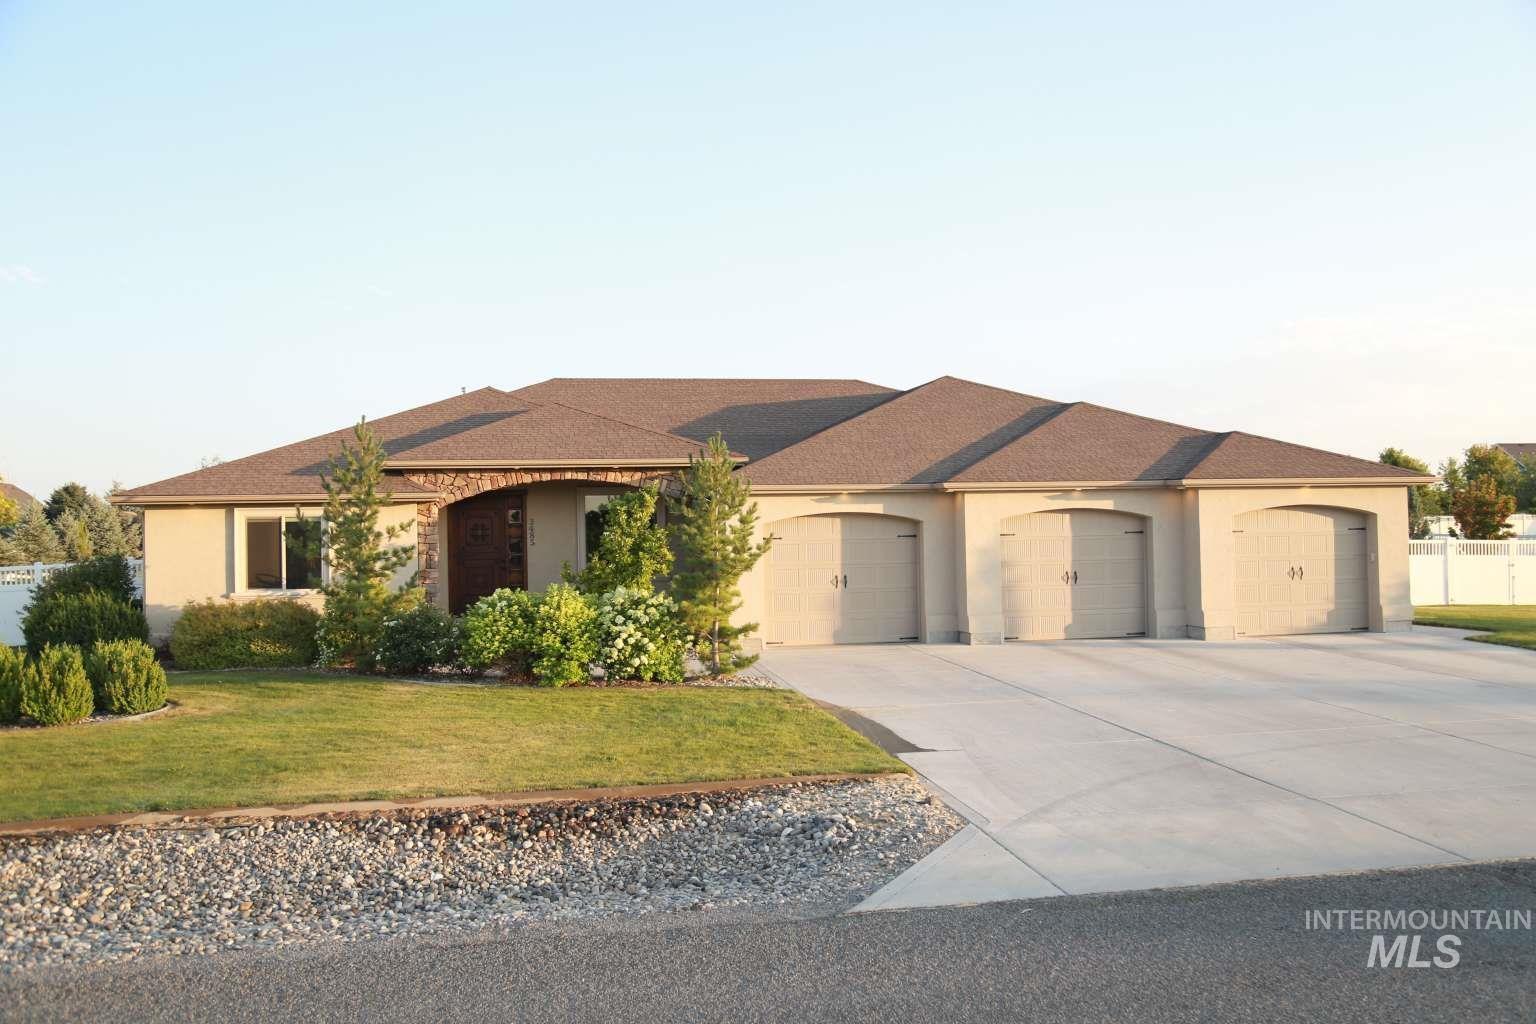 3485 E 3890 N Property Photo 1